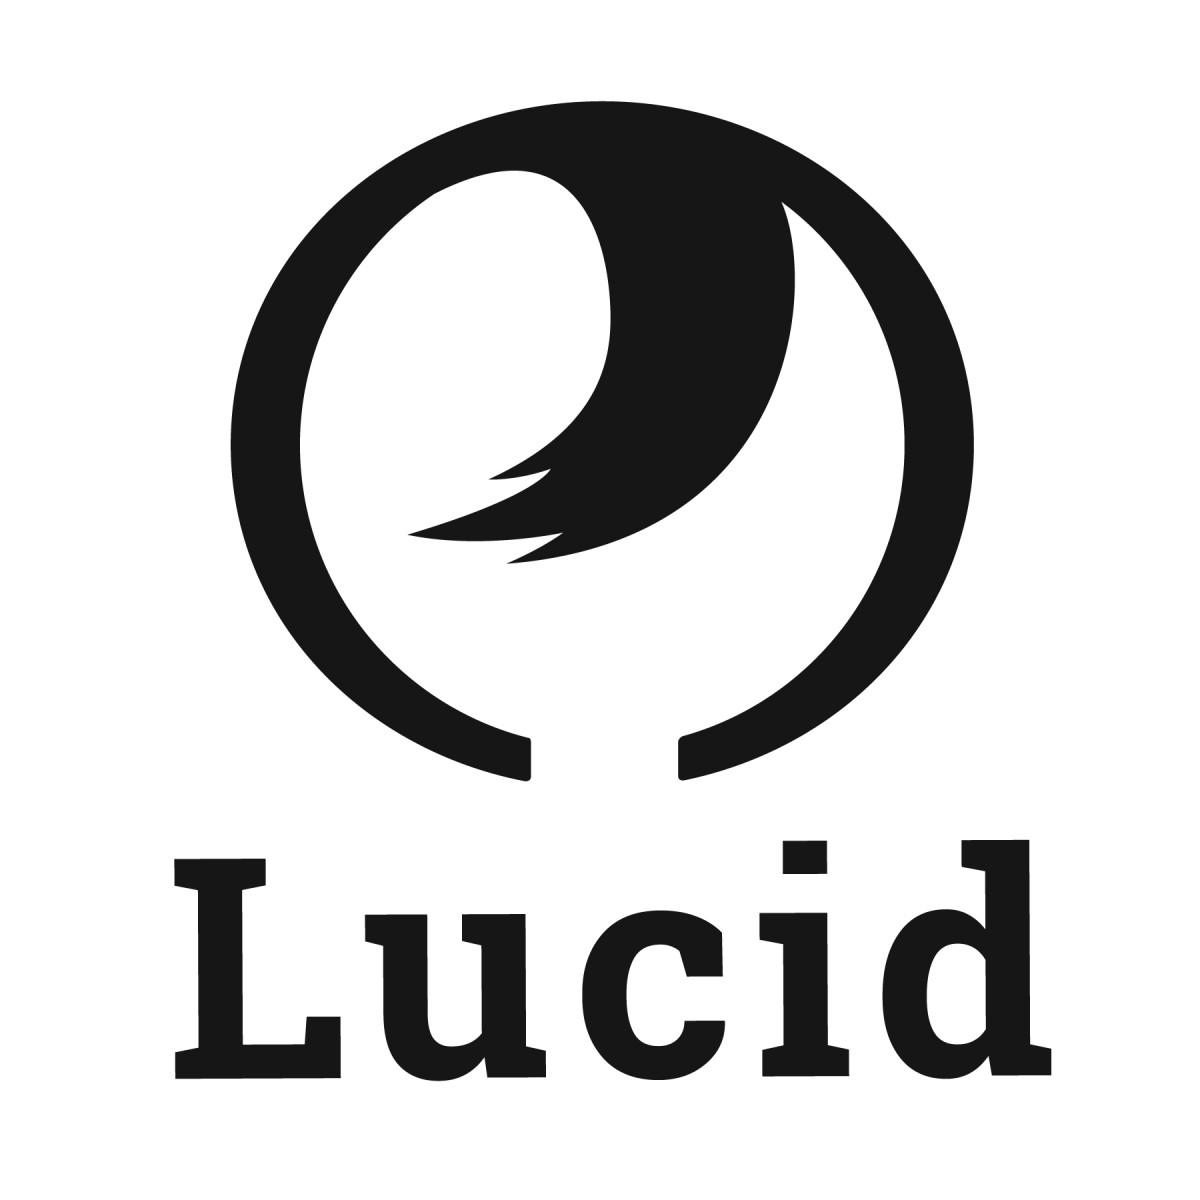 Lucid Logo Www Pixshark Com Images Galleries With A Bite